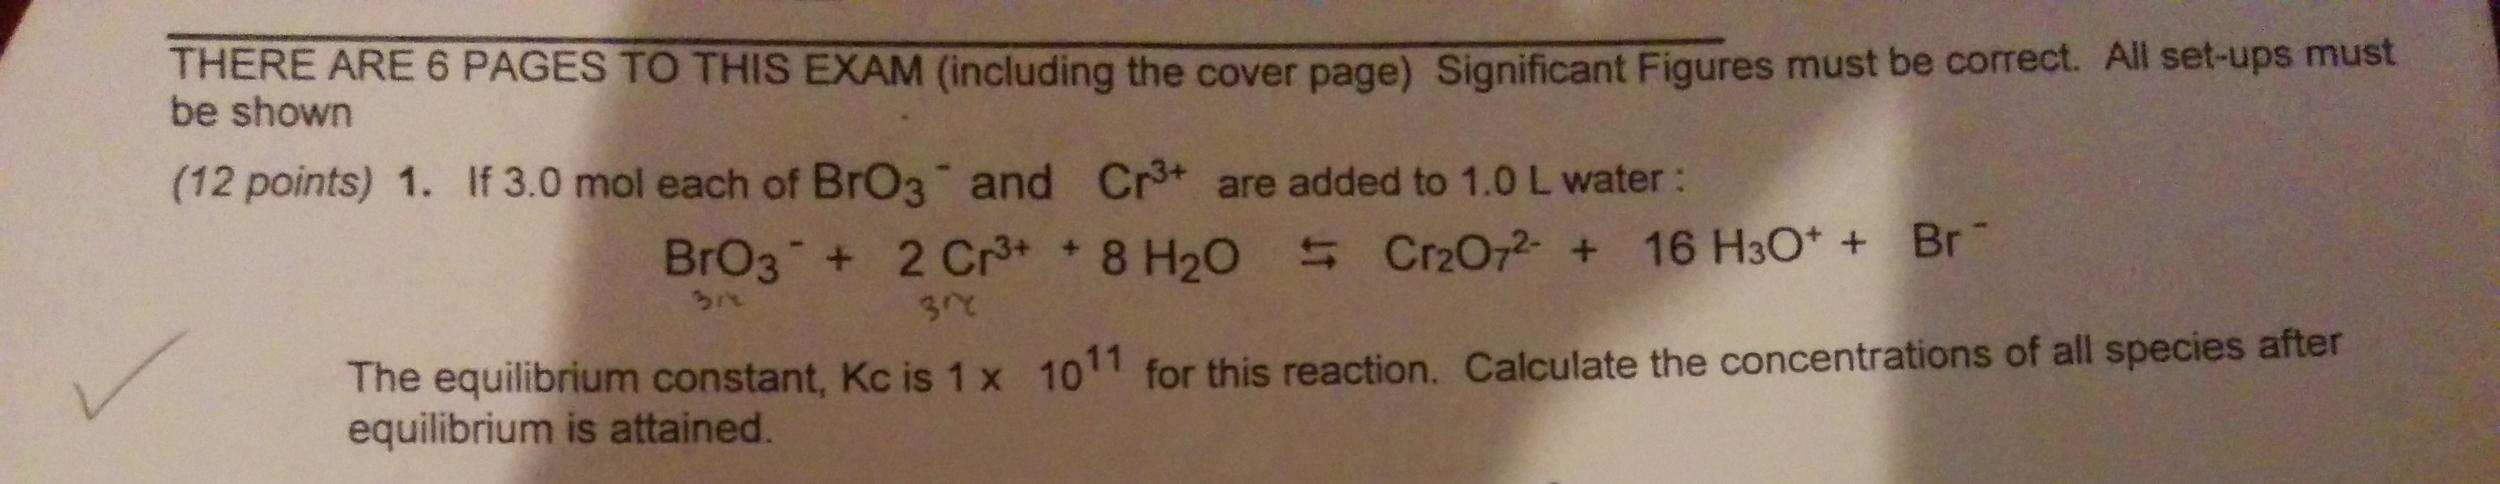 Chemistry Archive | April 19, 2016 | Chegg.com